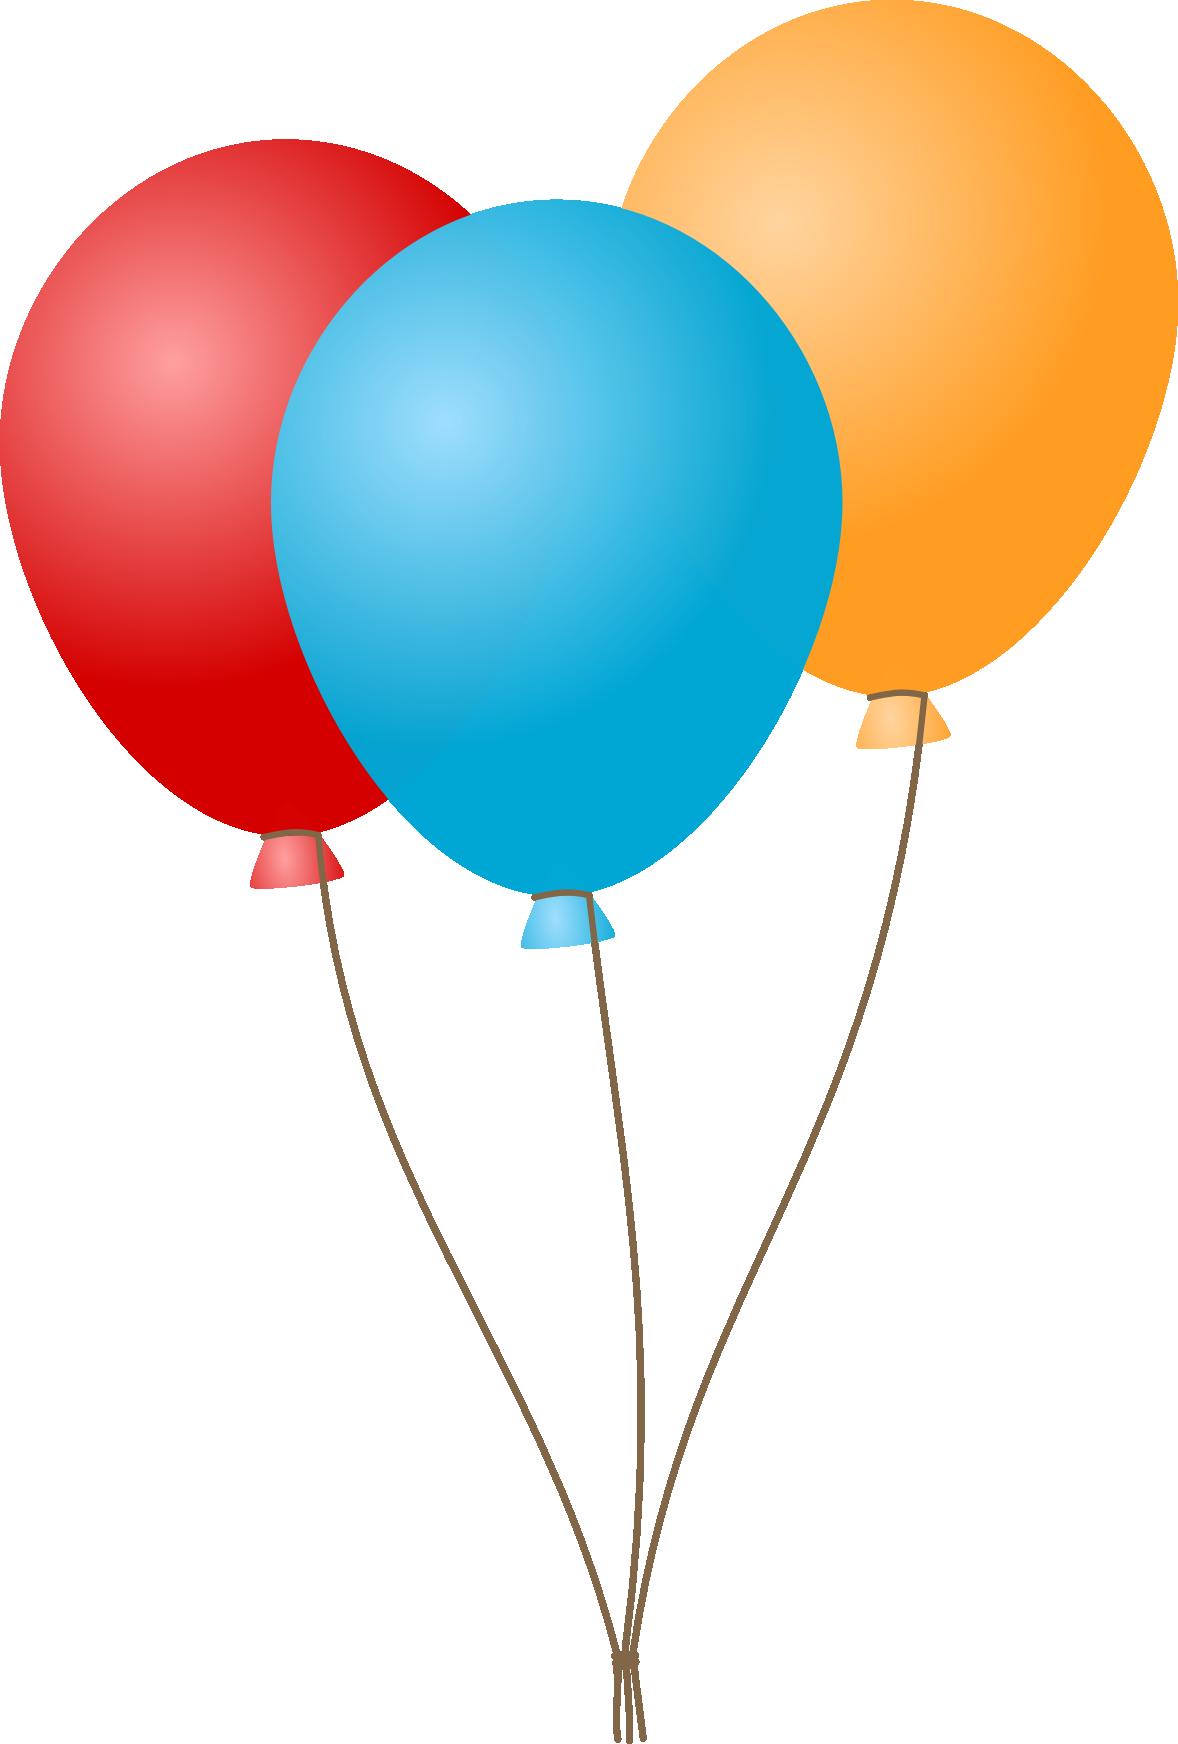 Balloon HD PNG - 91248